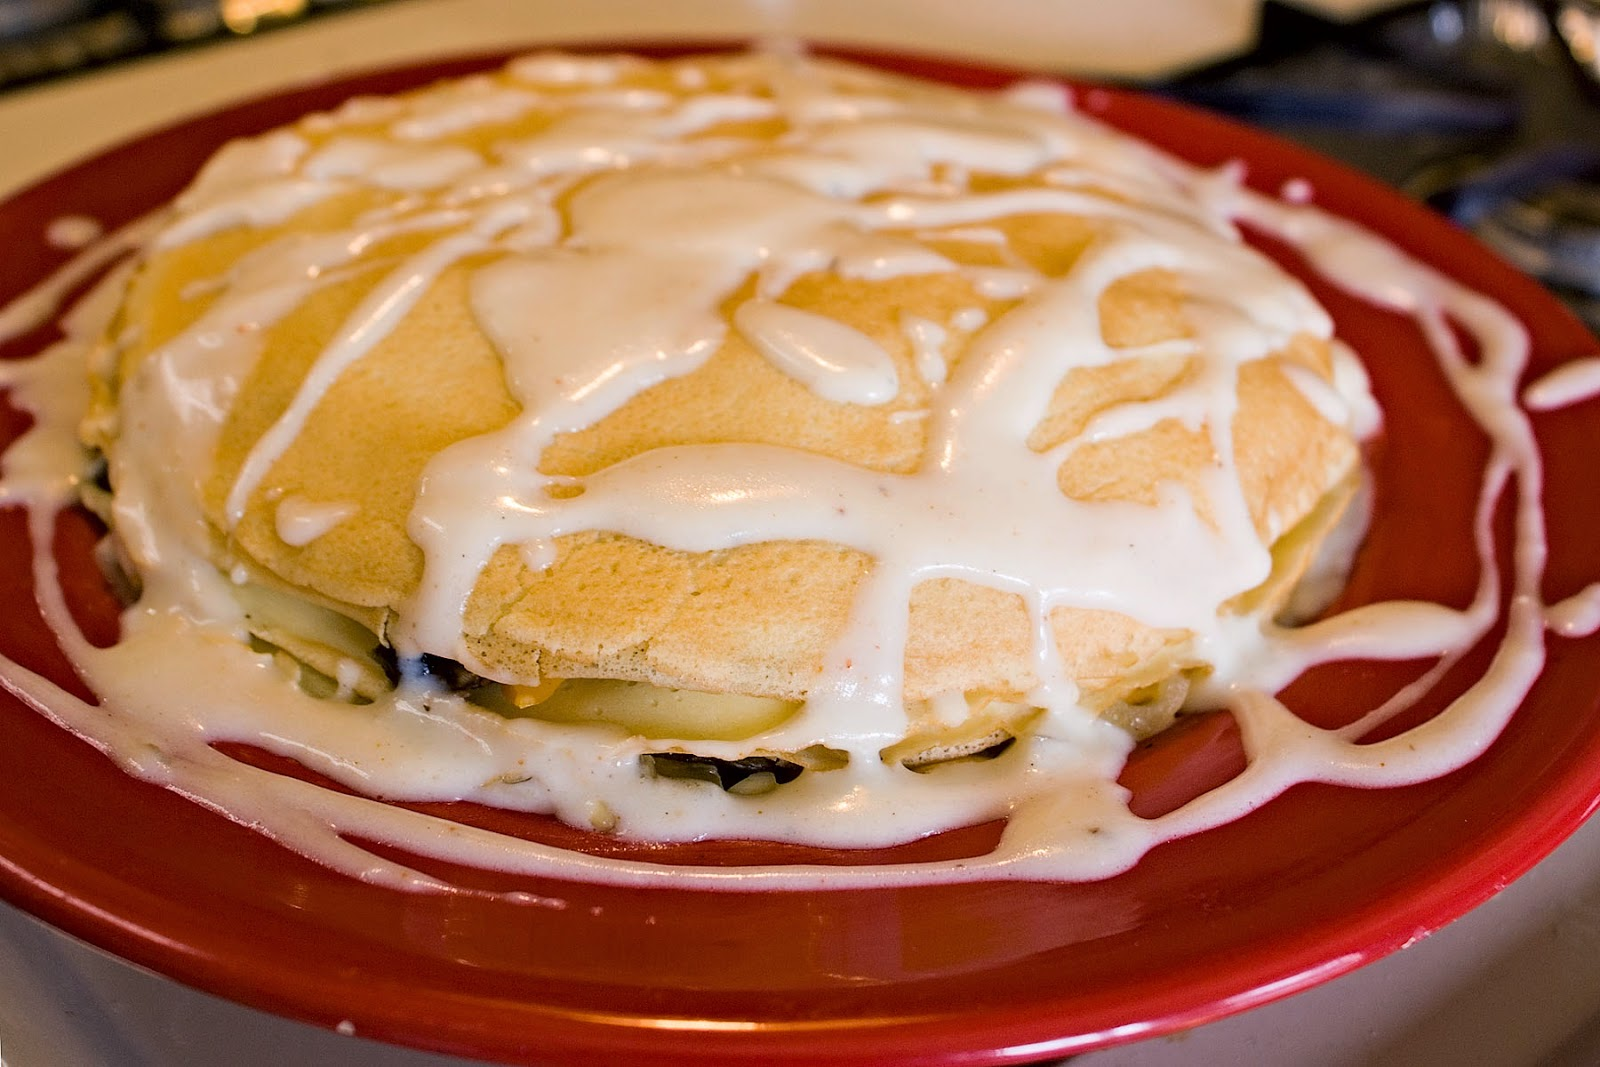 Crepes, Denver Omelette-Style